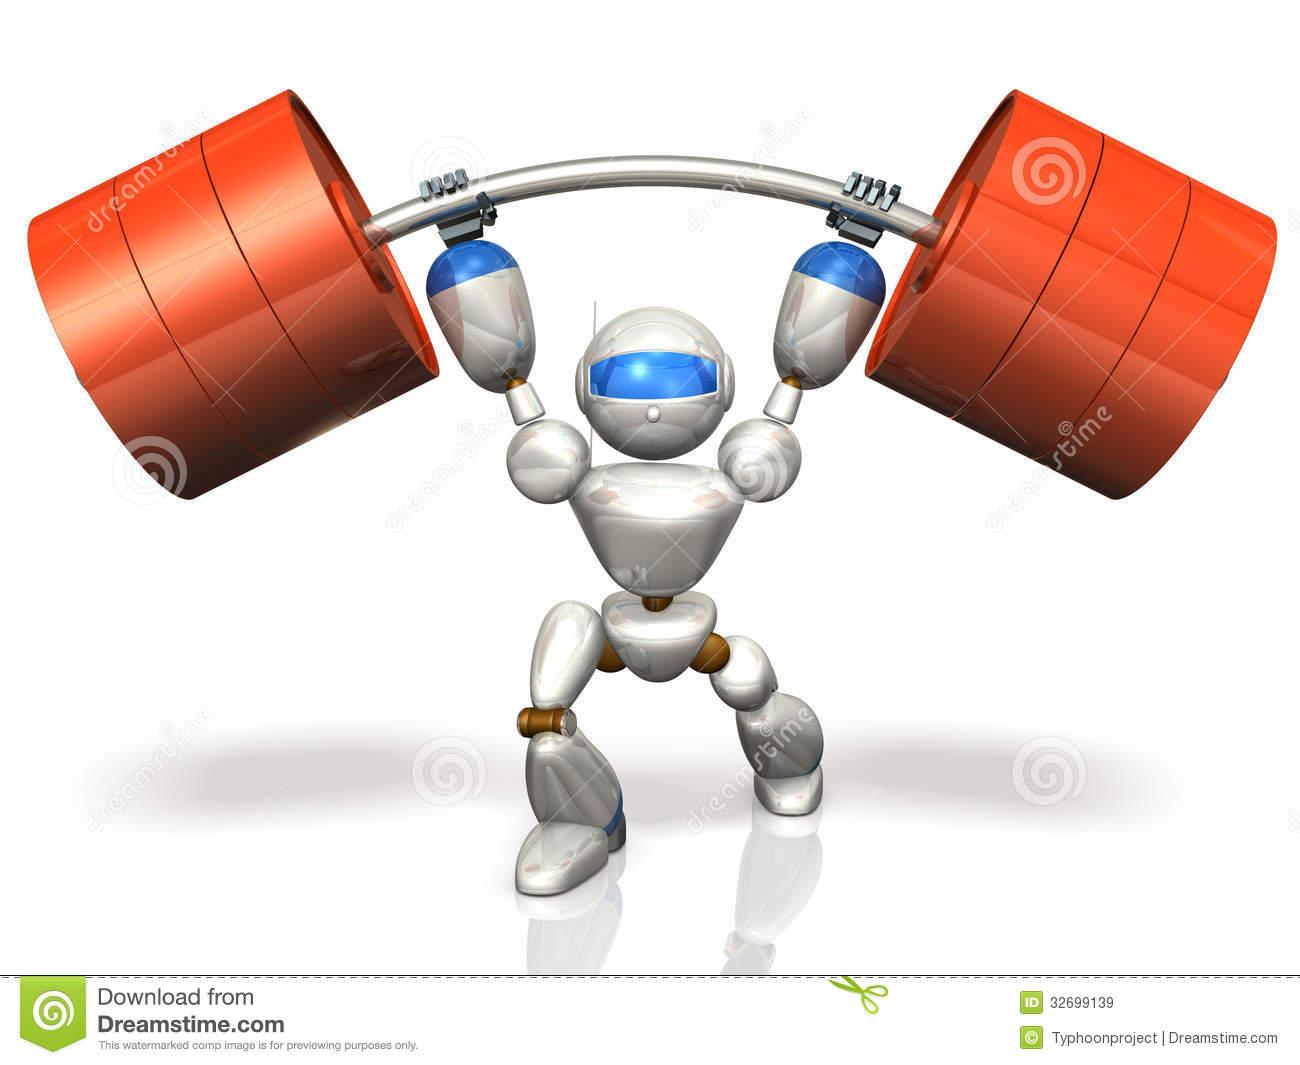 Humanoid Robot Is Possesses Superhuman Strength. Royalty Free.